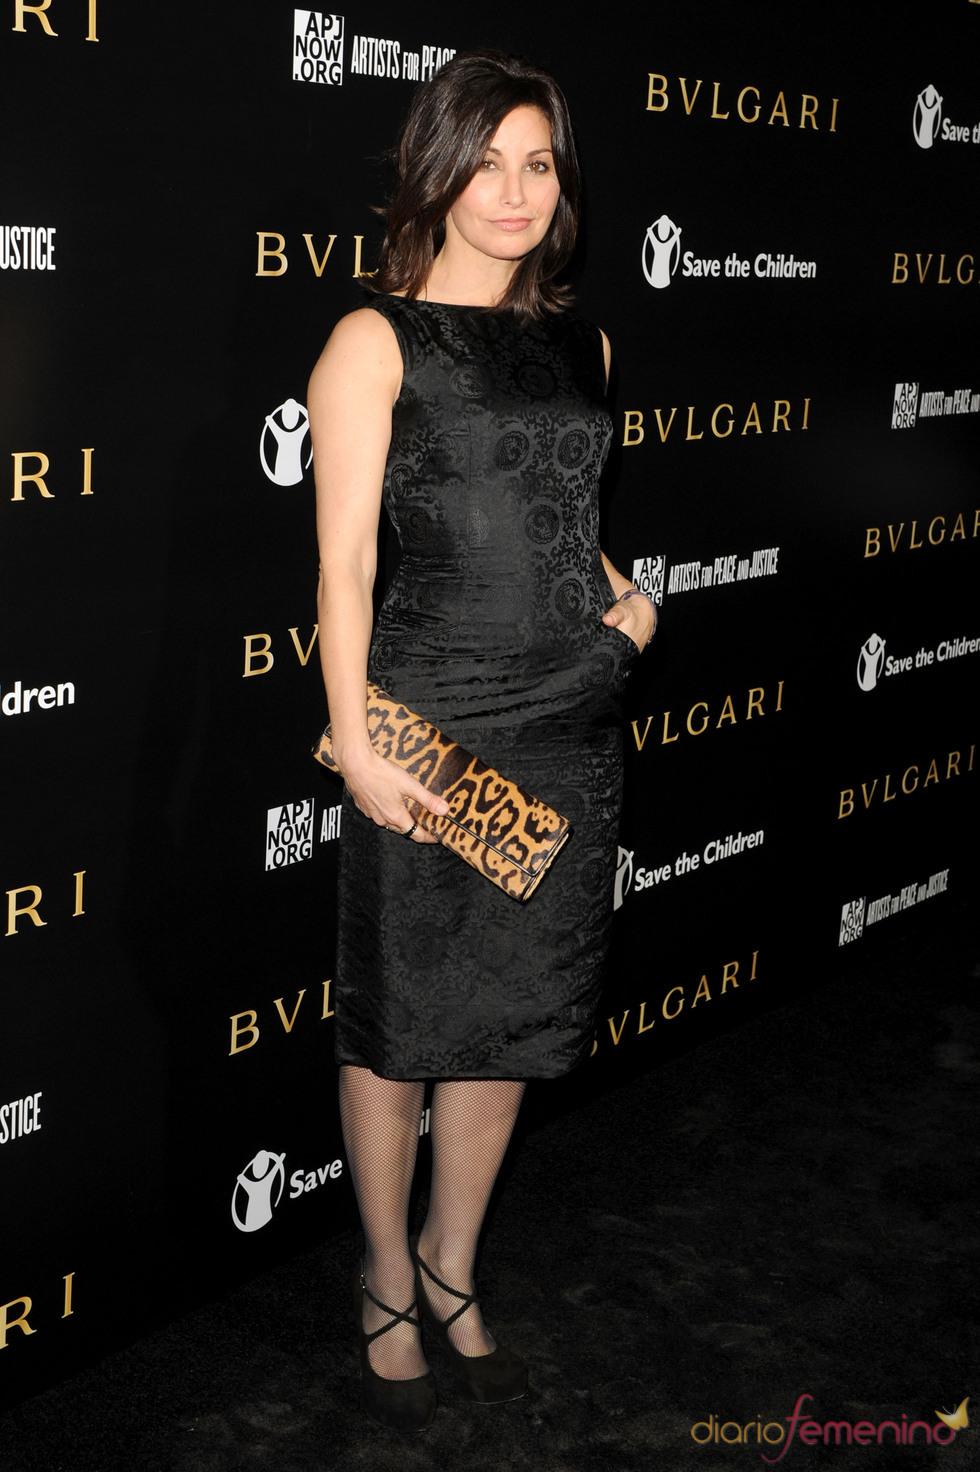 Gina Gershon en la gala benéfica de Bulgari